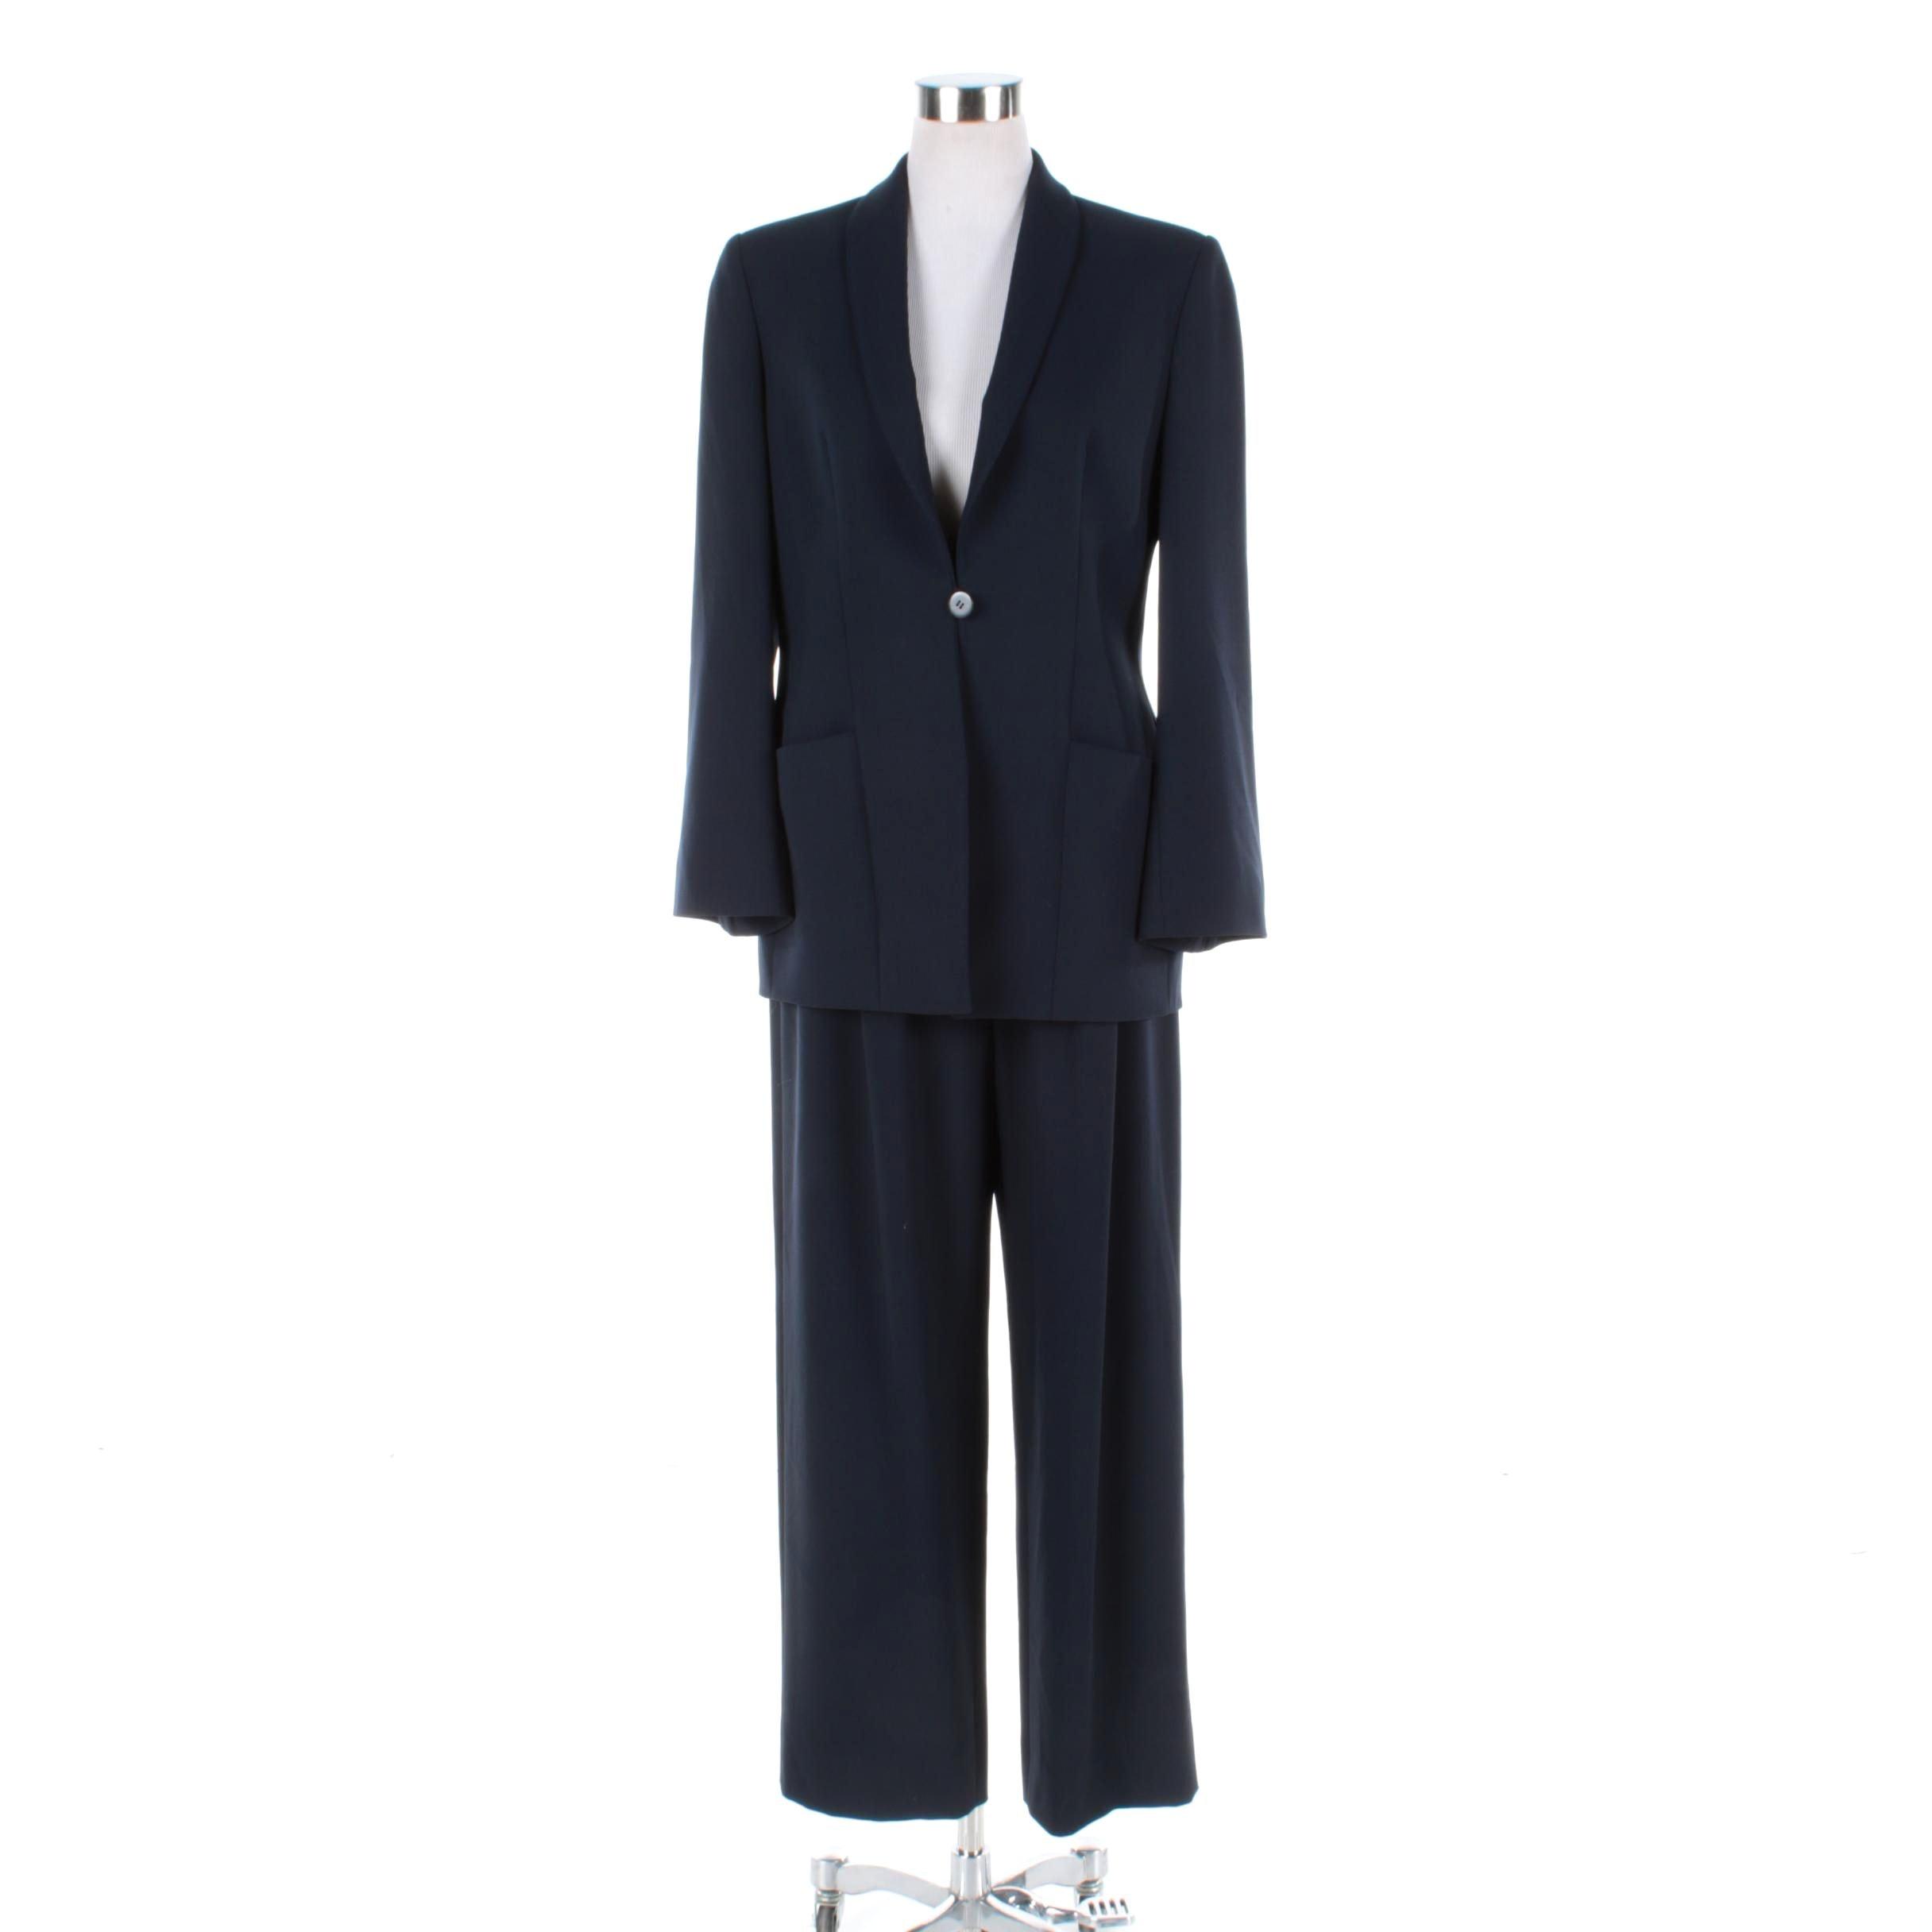 Women's Vintage Giorgio Armani Navy Blue Wool Pant Suit